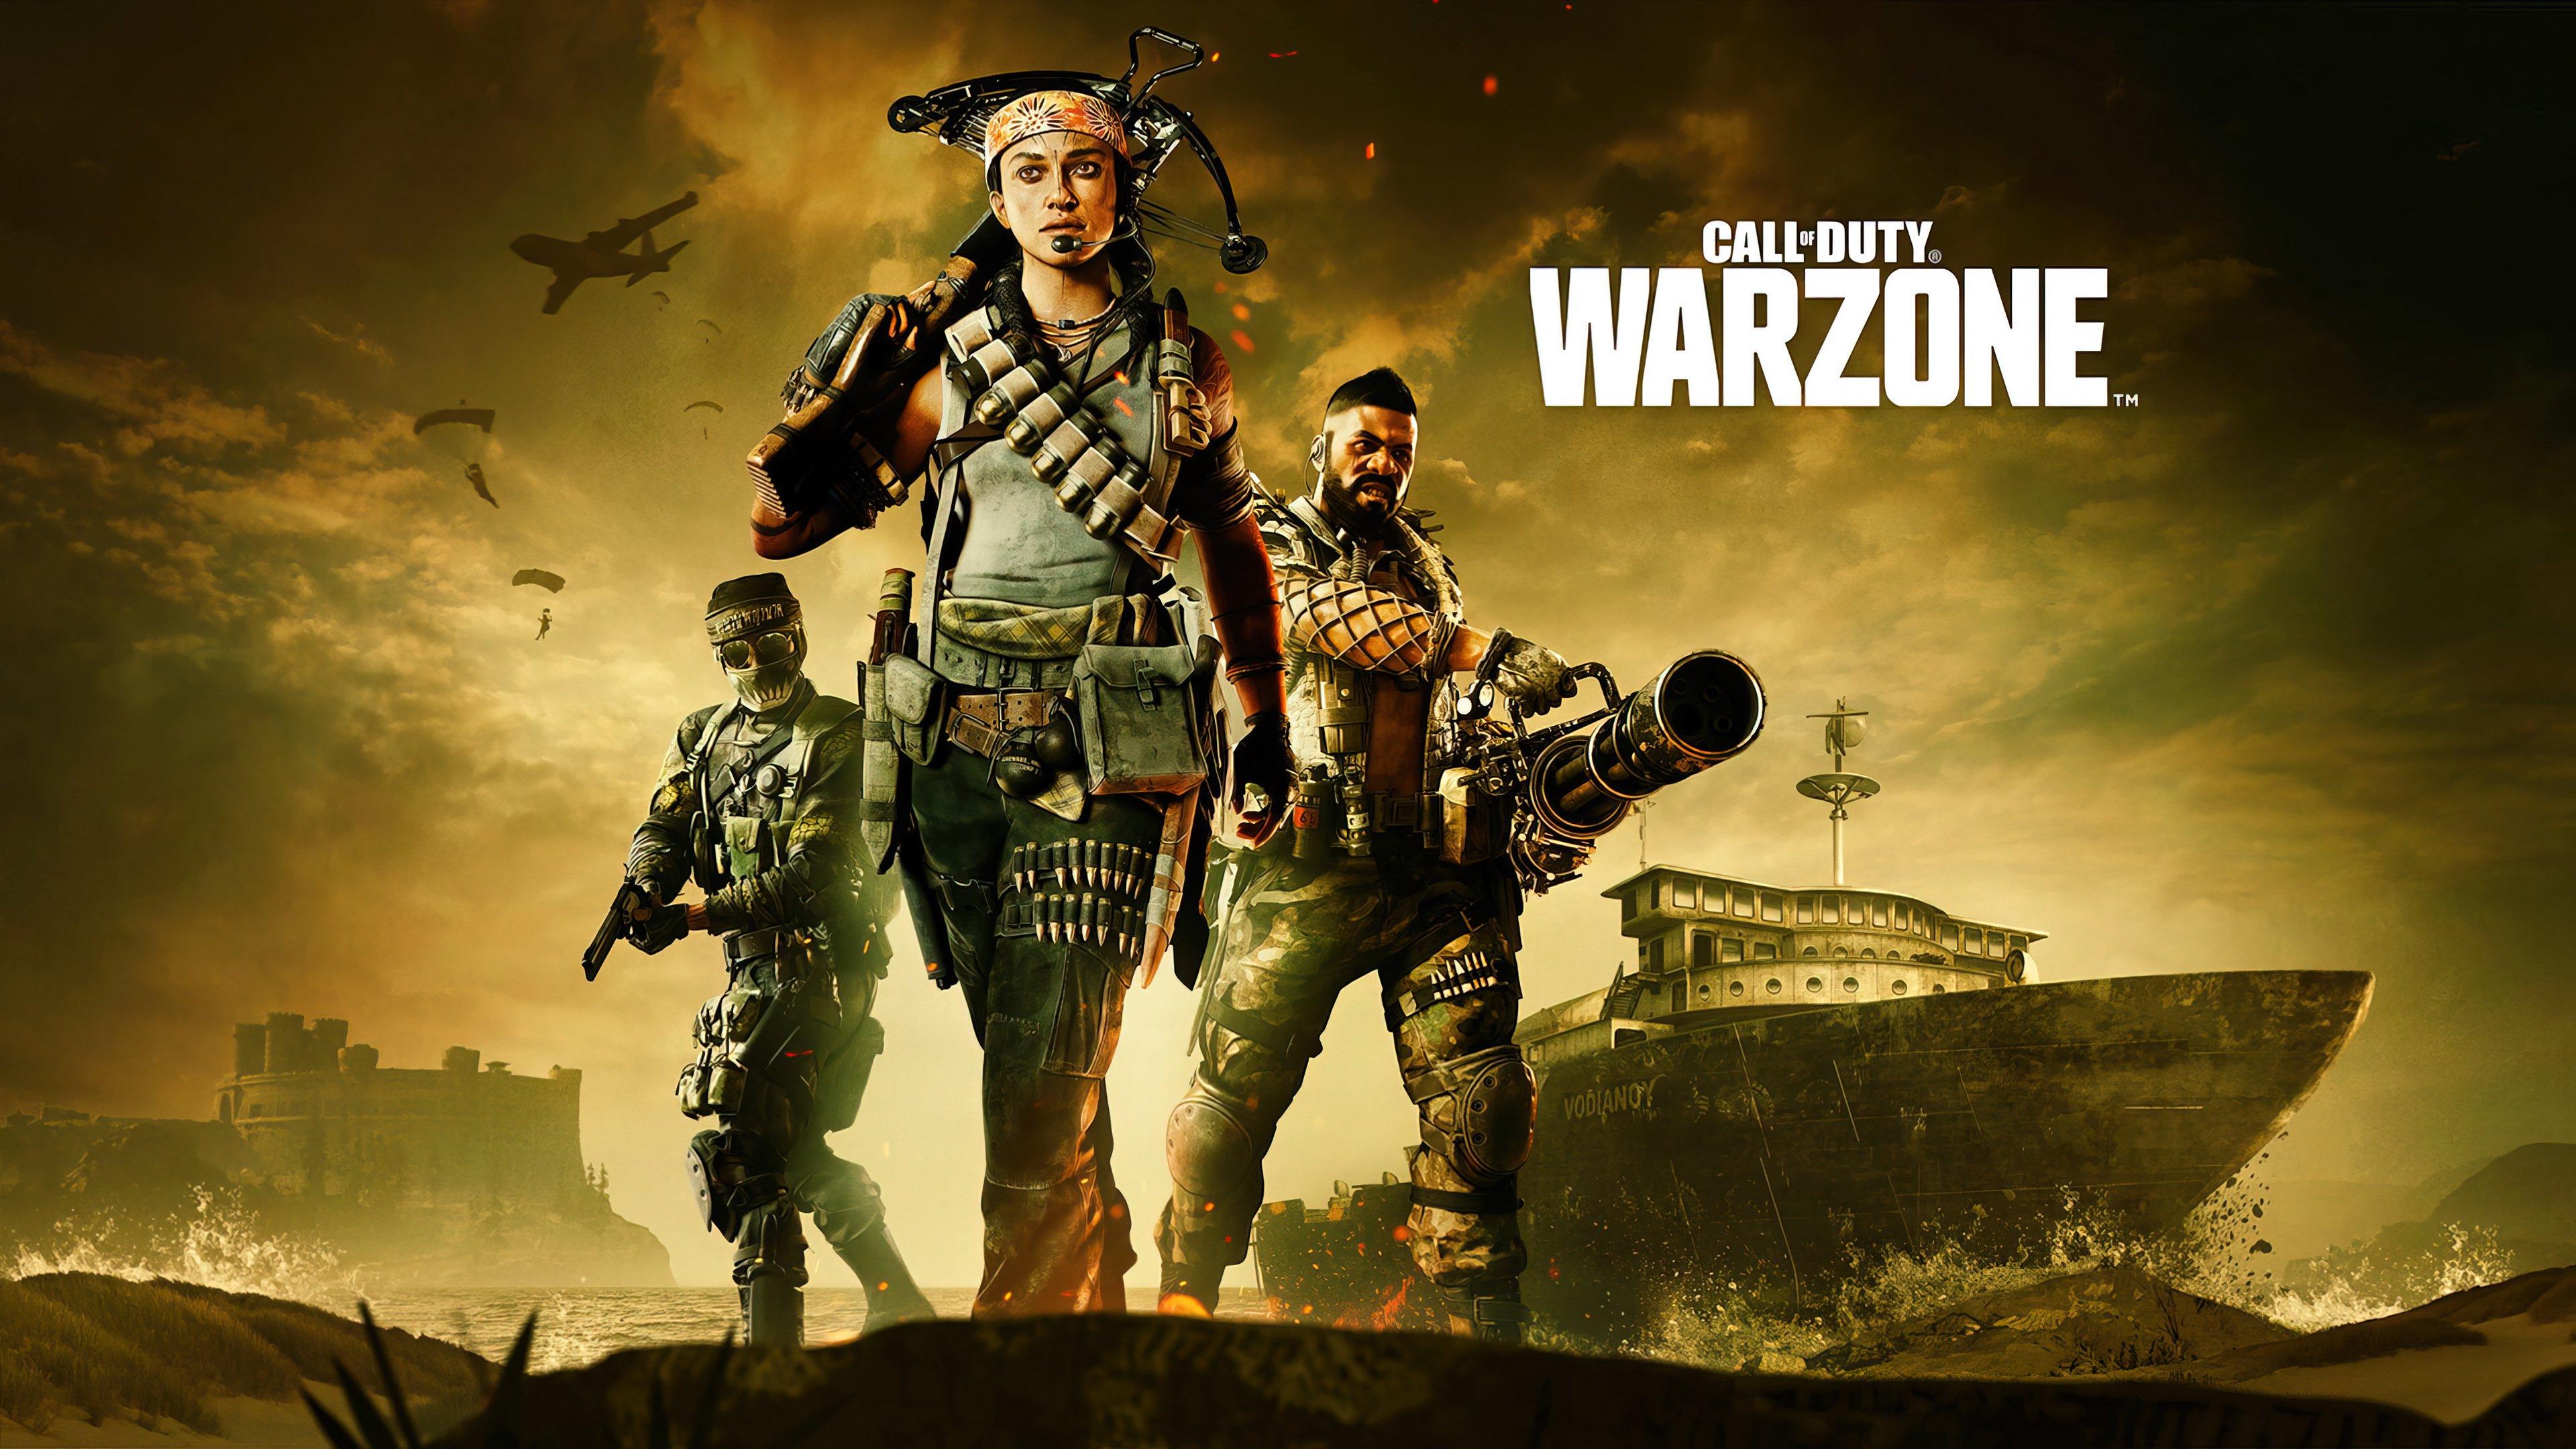 Fondos de pantalla Call of Duty Warzone 2021